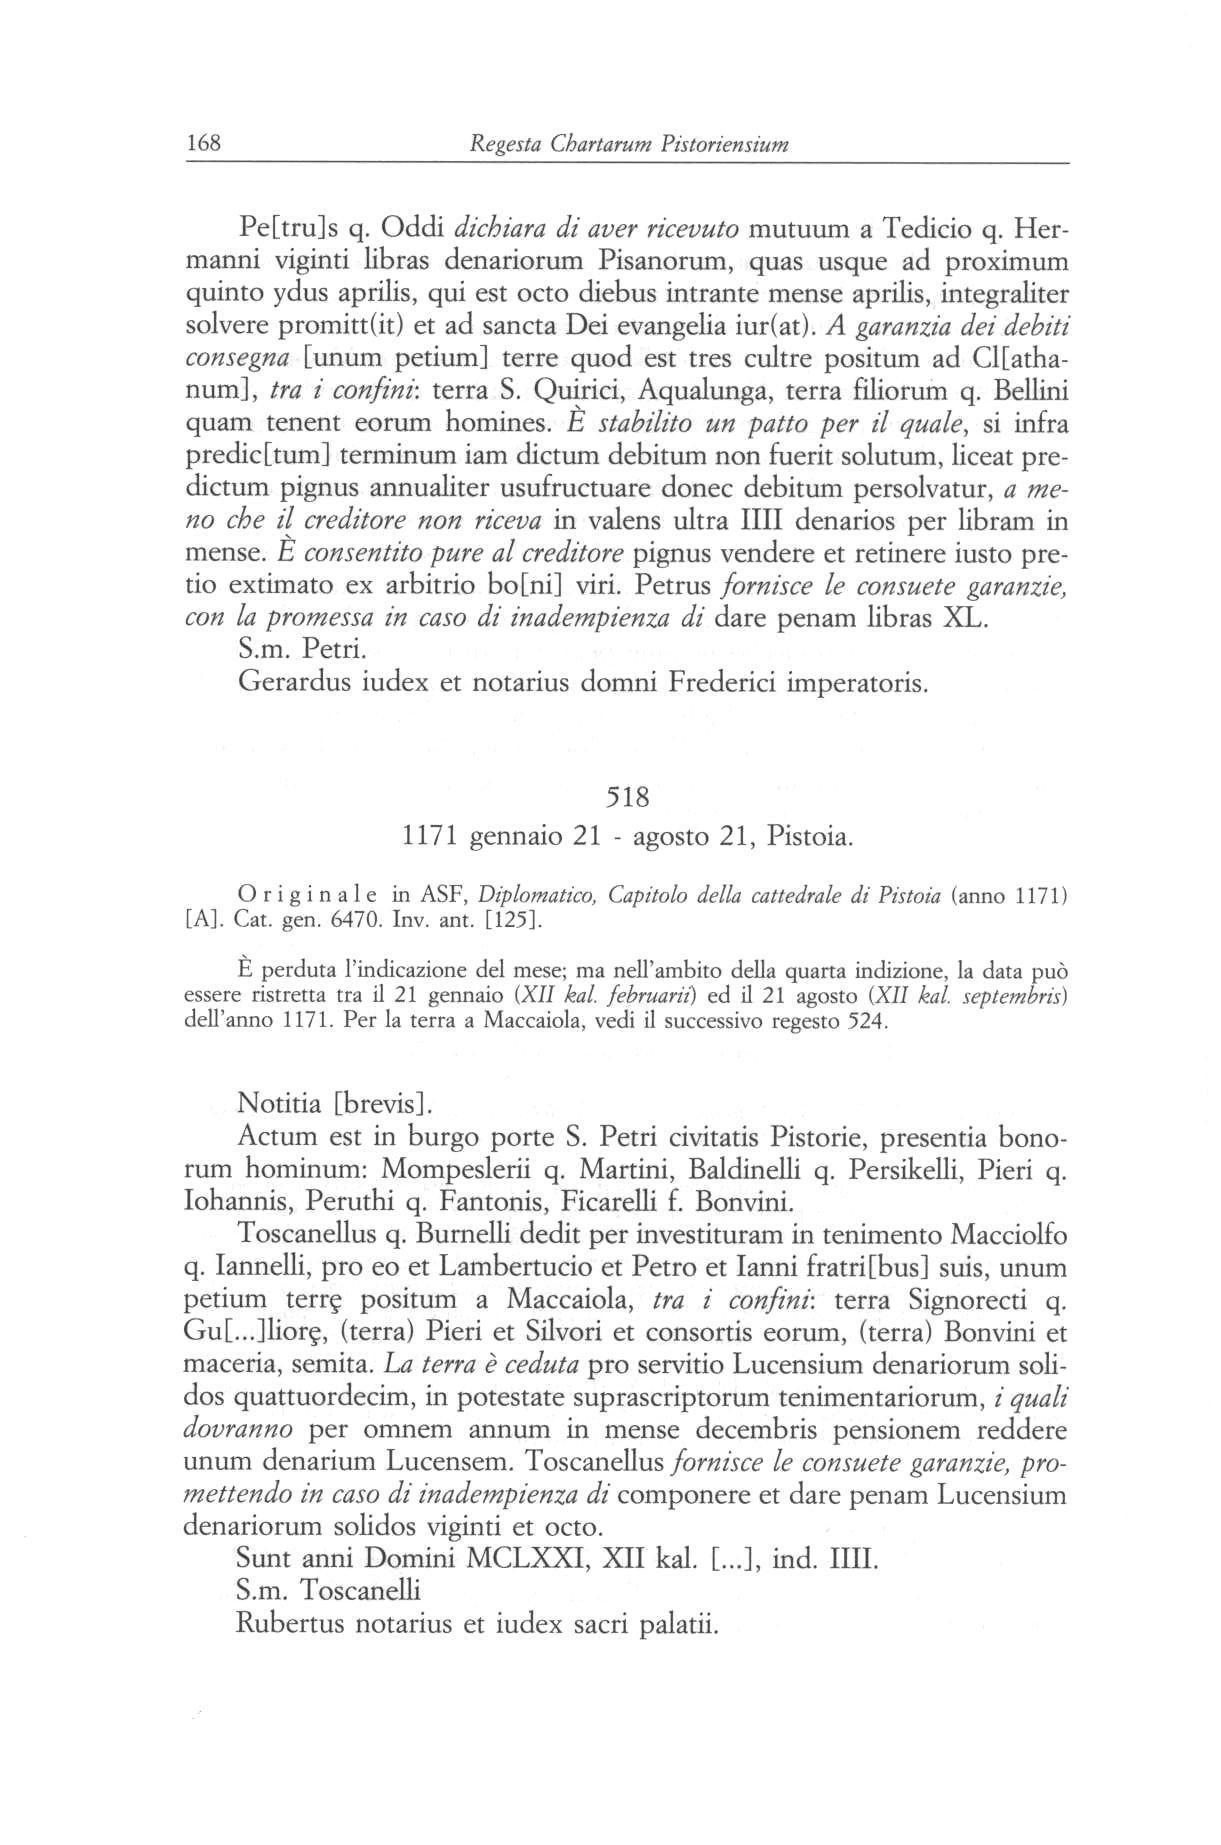 Canonica S. Zenone XII 0168.jpg